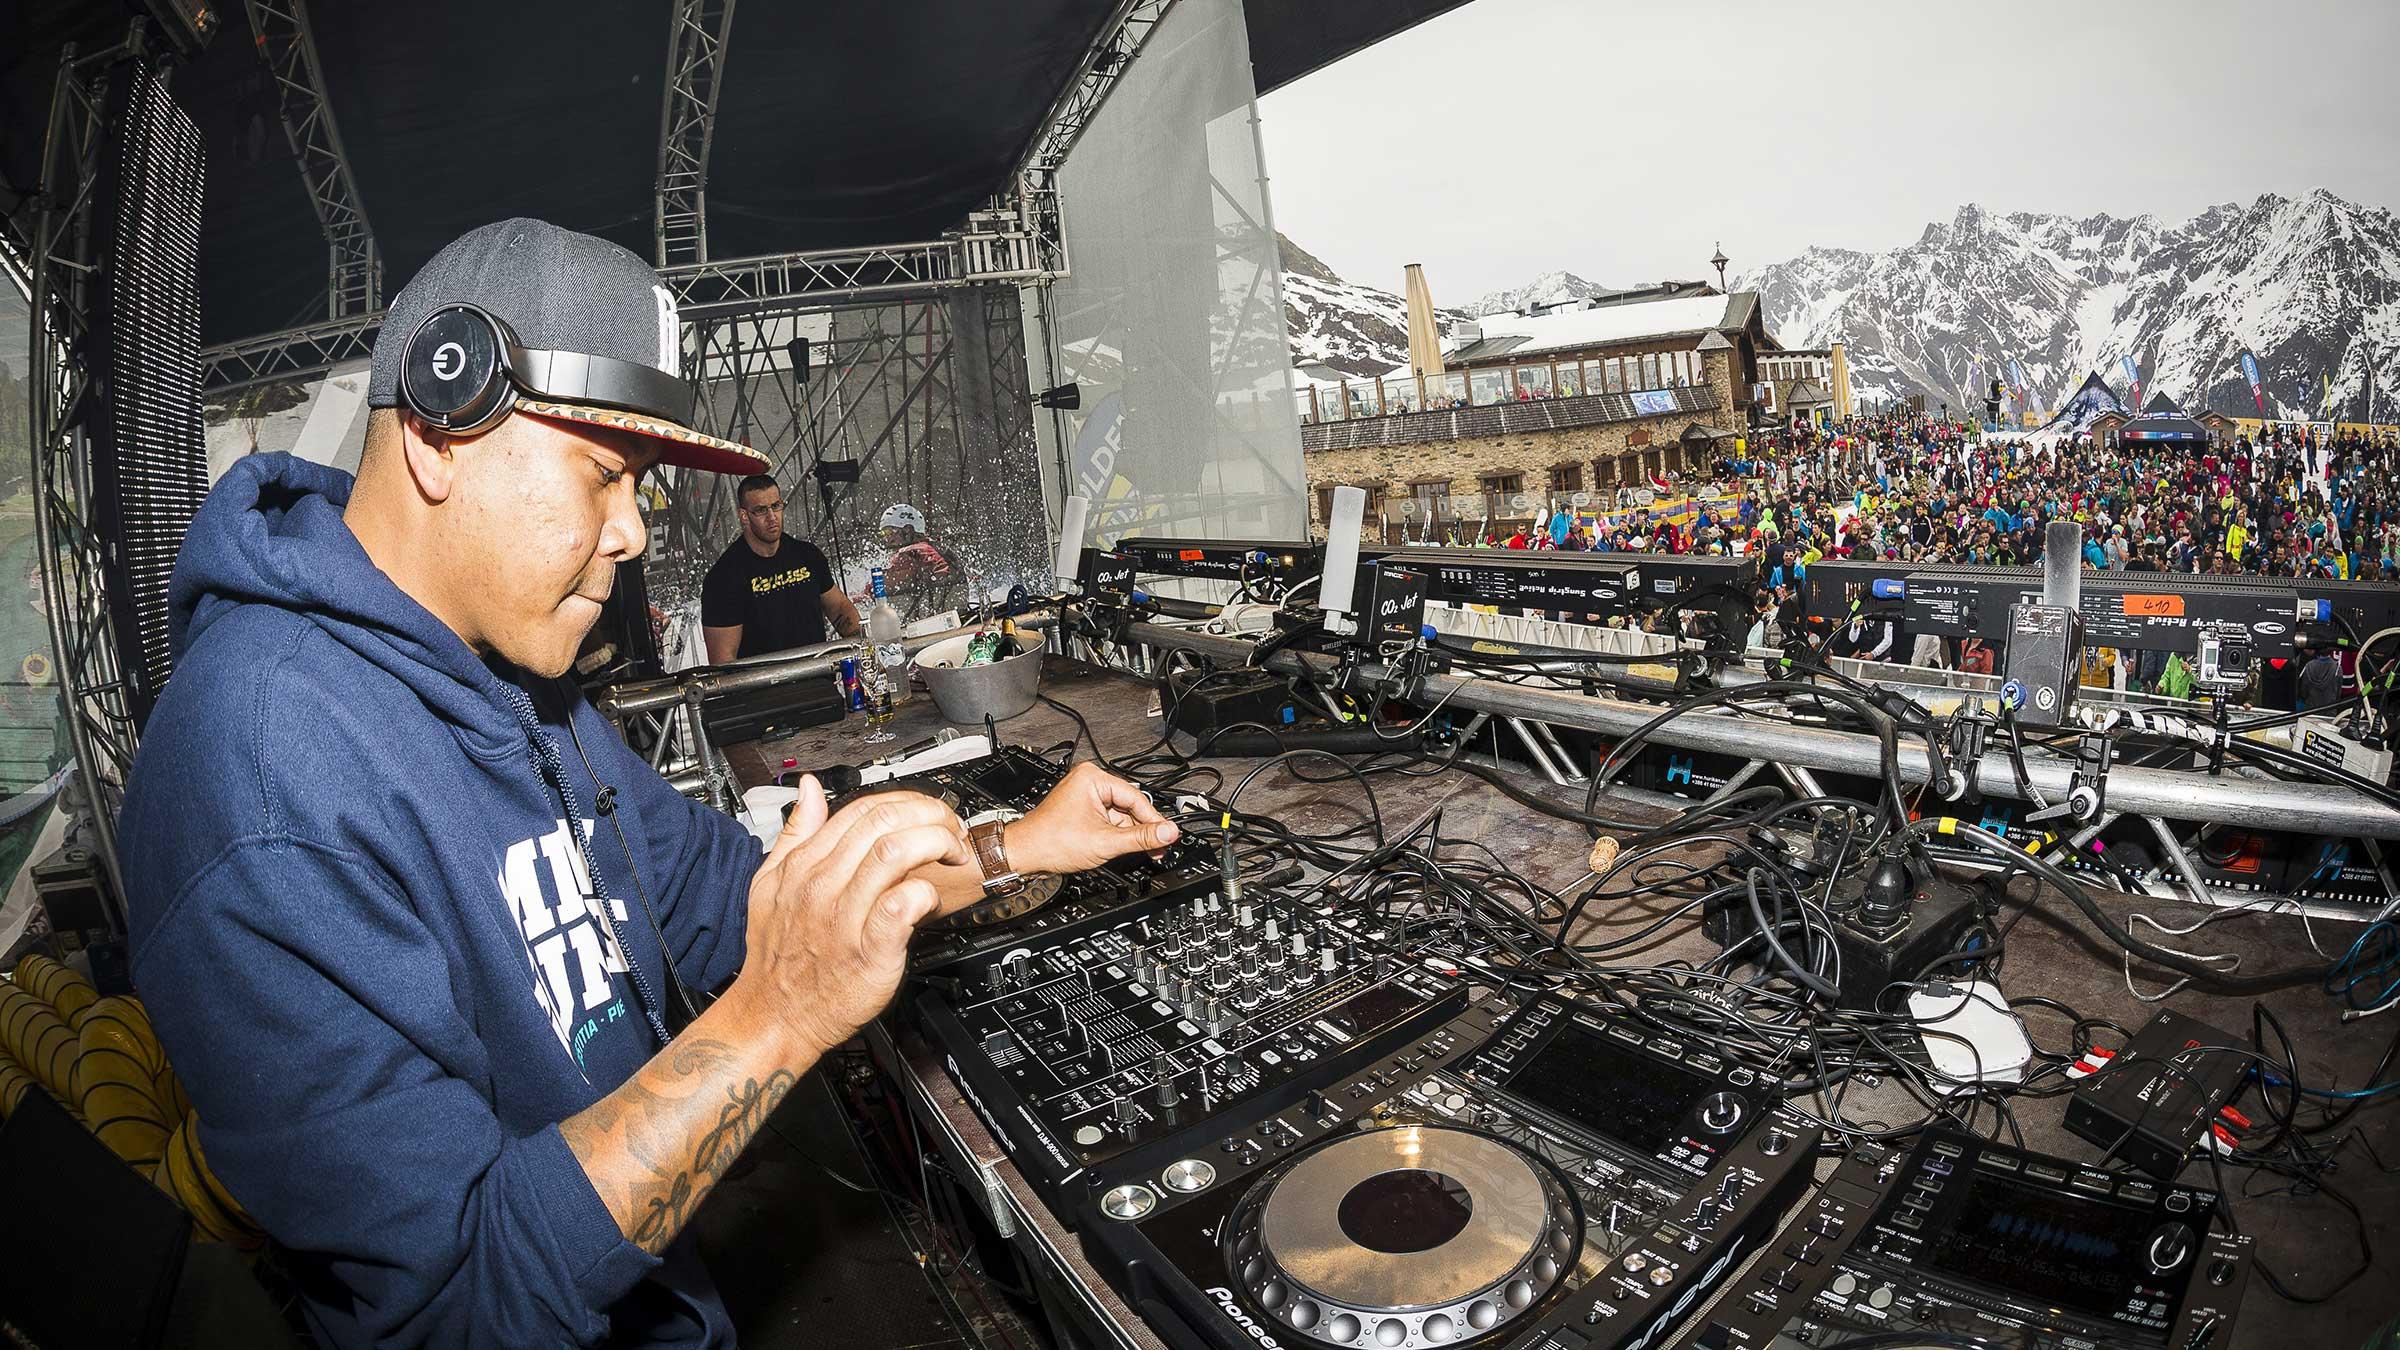 DJ beim Auflegen - EMF Pre-Silvester Party Sölden